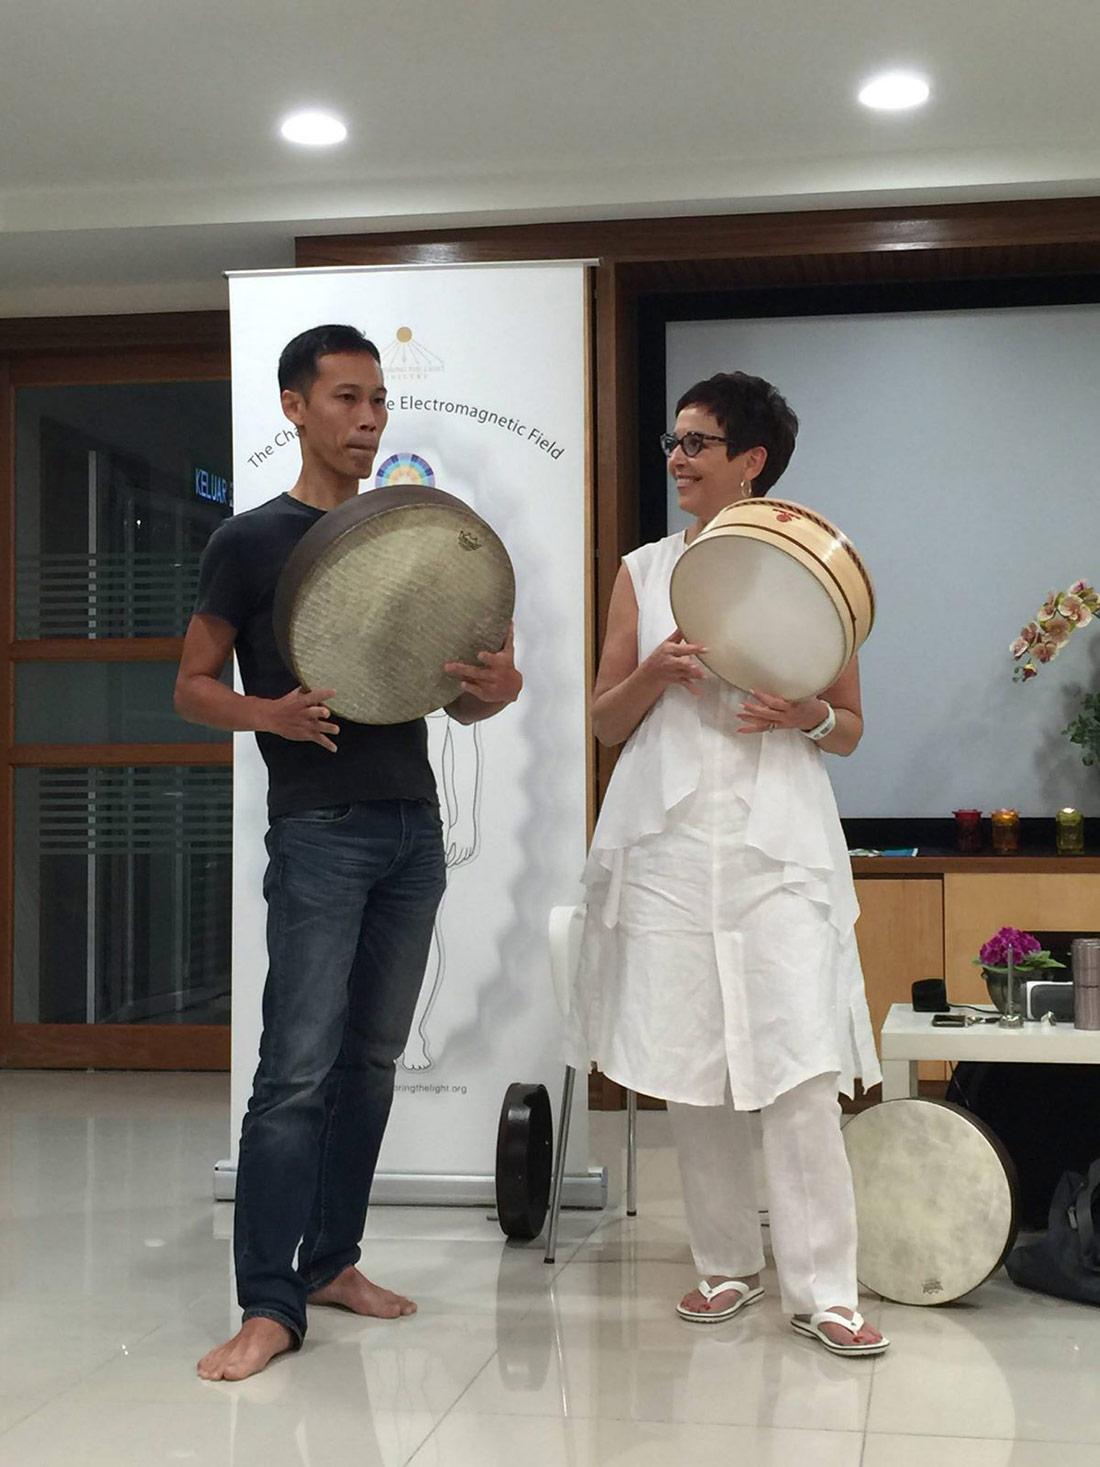 Dehyana drumming